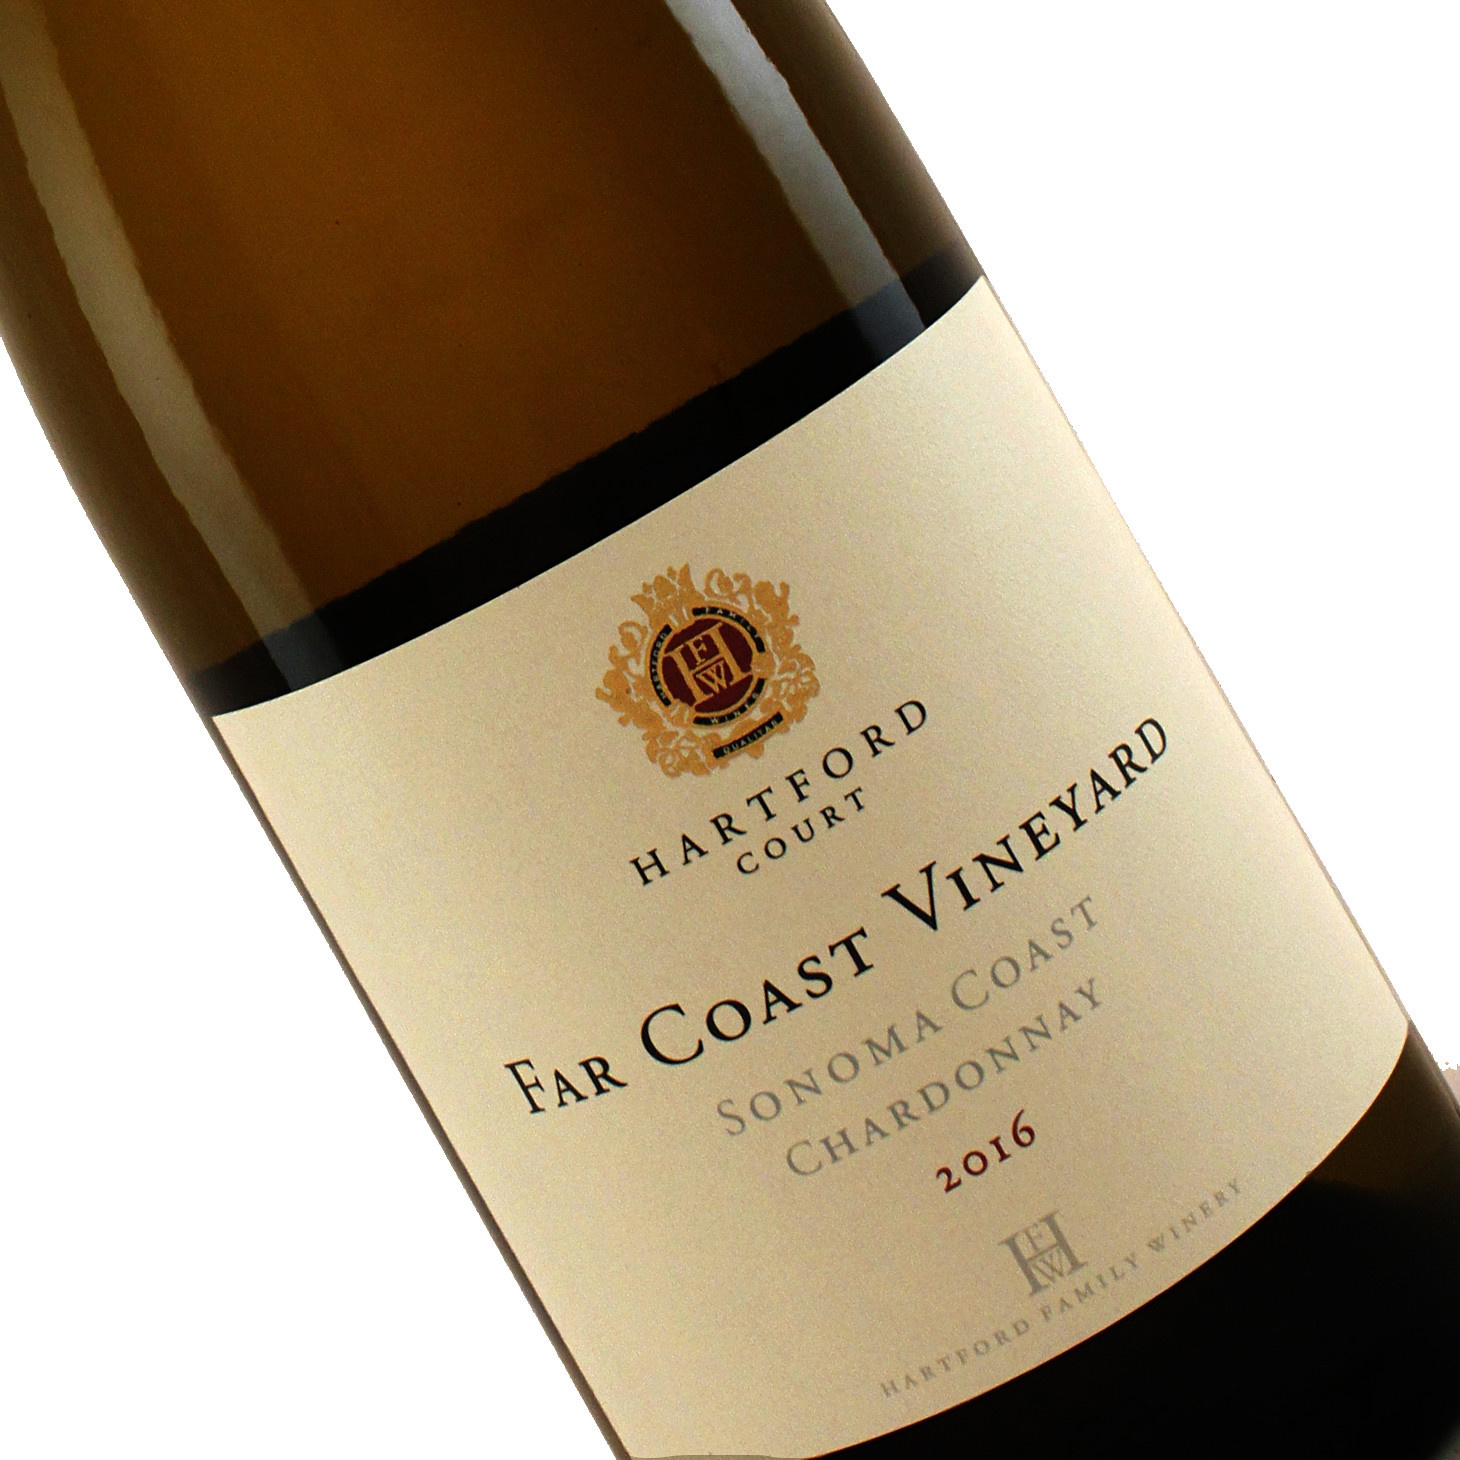 Hartford Court 2016 Chardonnay Far Coast Vineyard Sonoma Coast